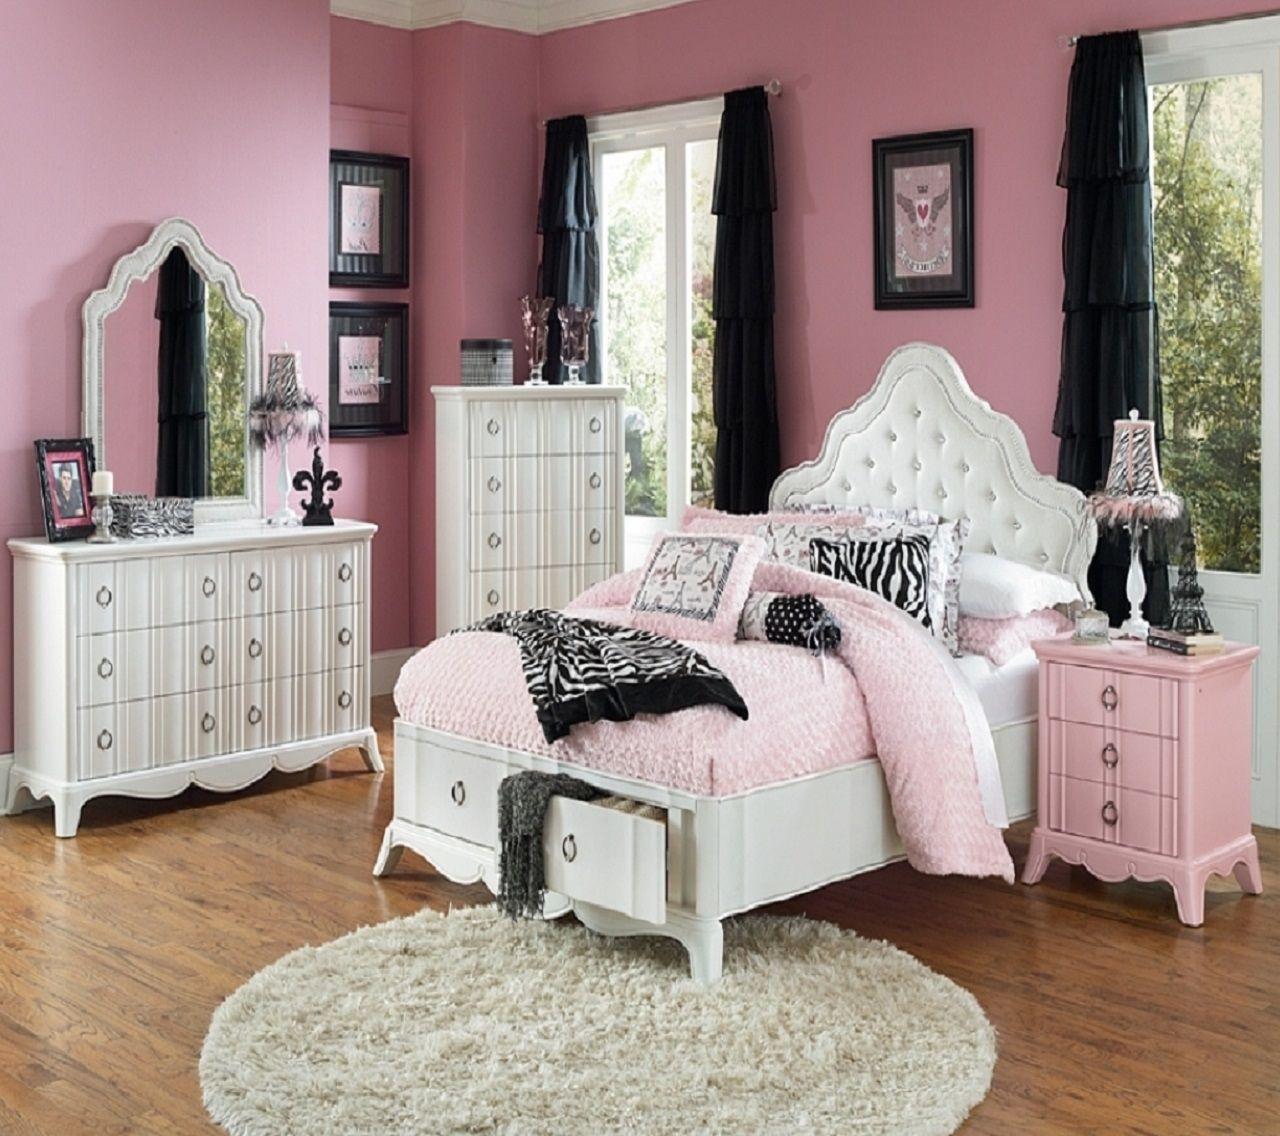 int. pink & black bedroom large #episodeinteractive #episode size